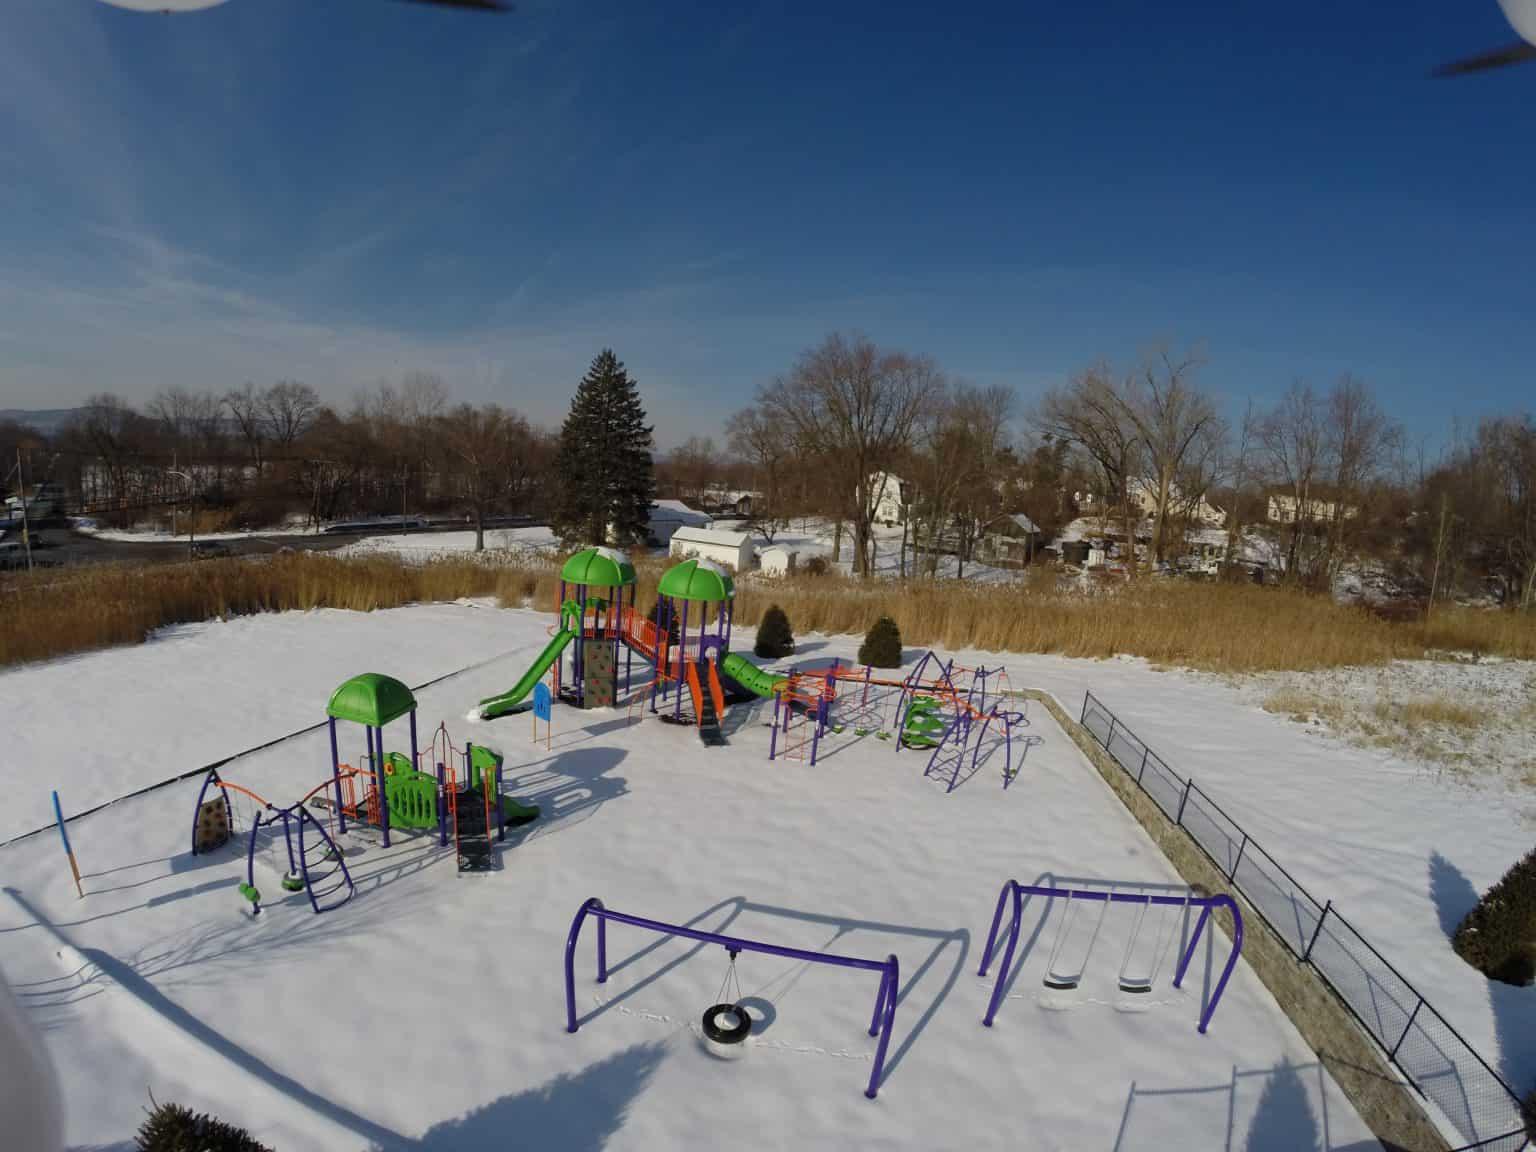 wiss-park-playground-wayne-nj_11652602675_o-1536x1152